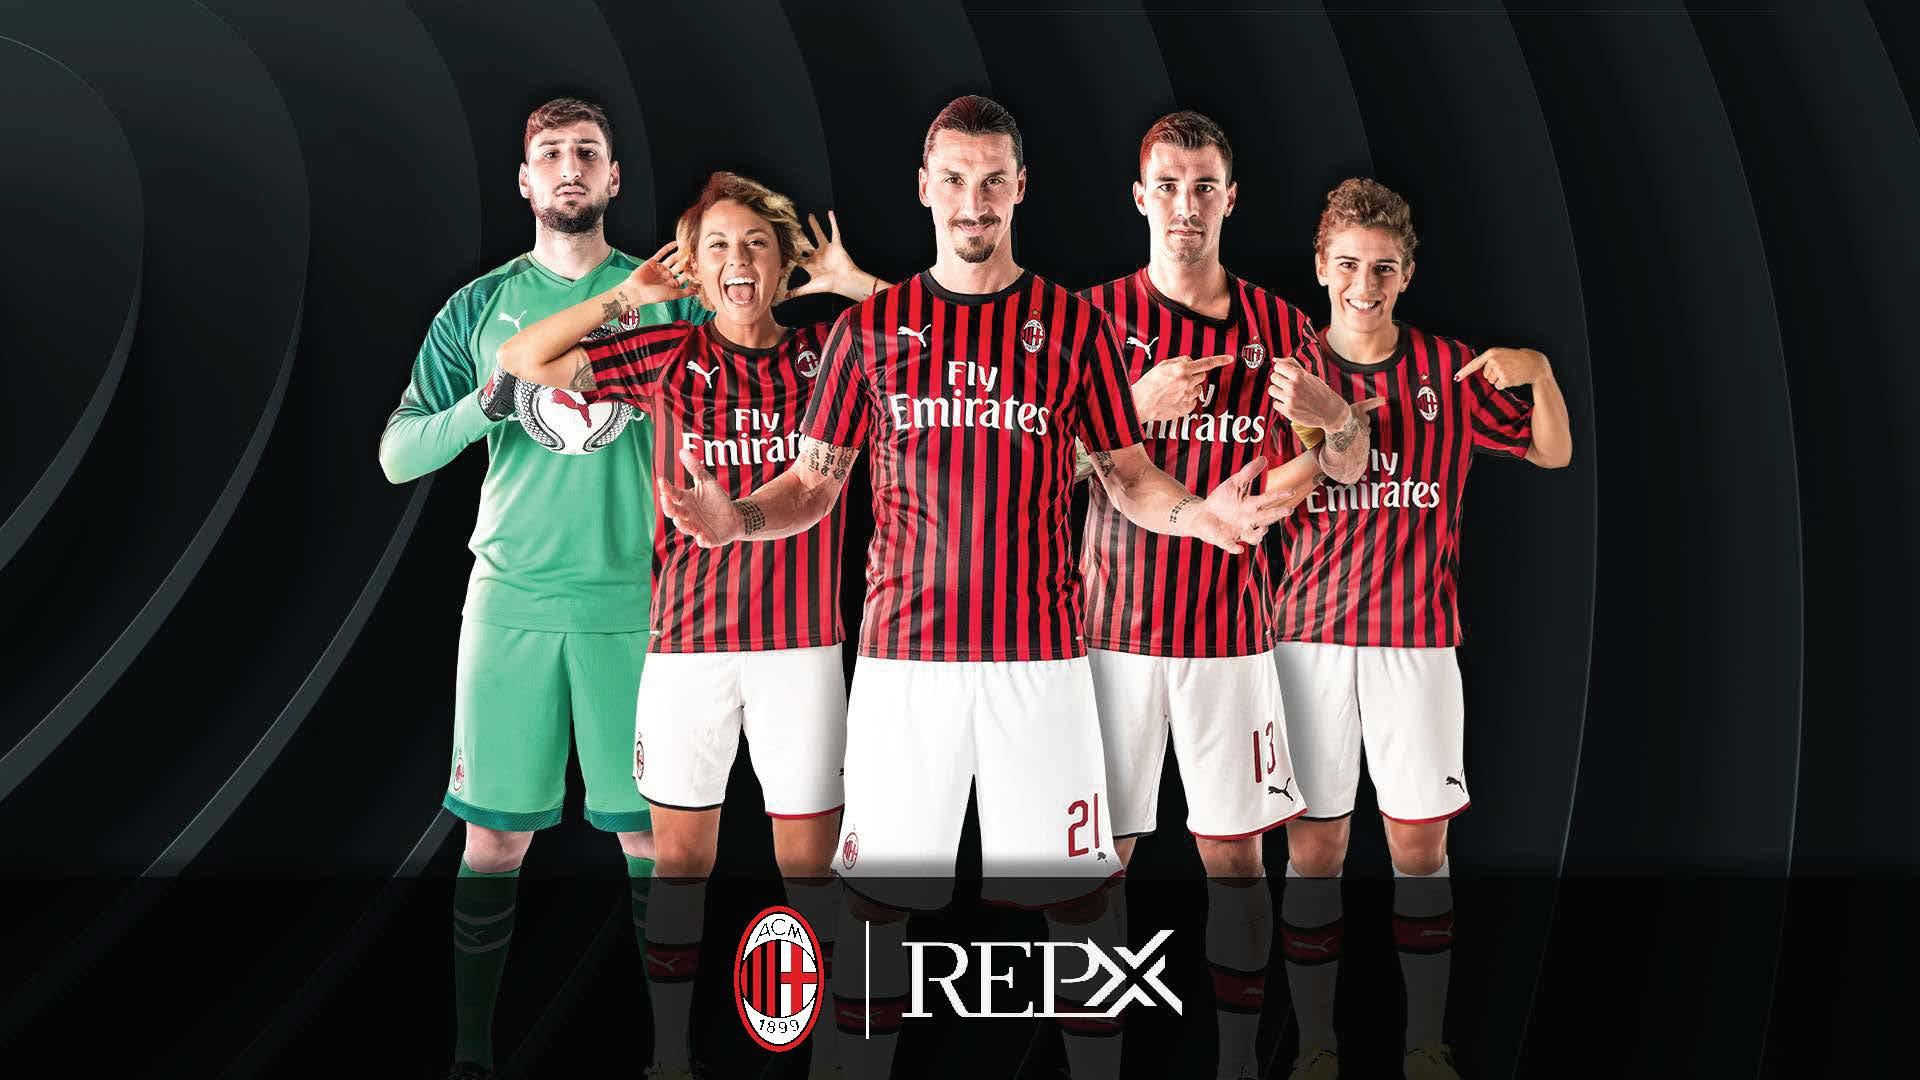 Repx Milan